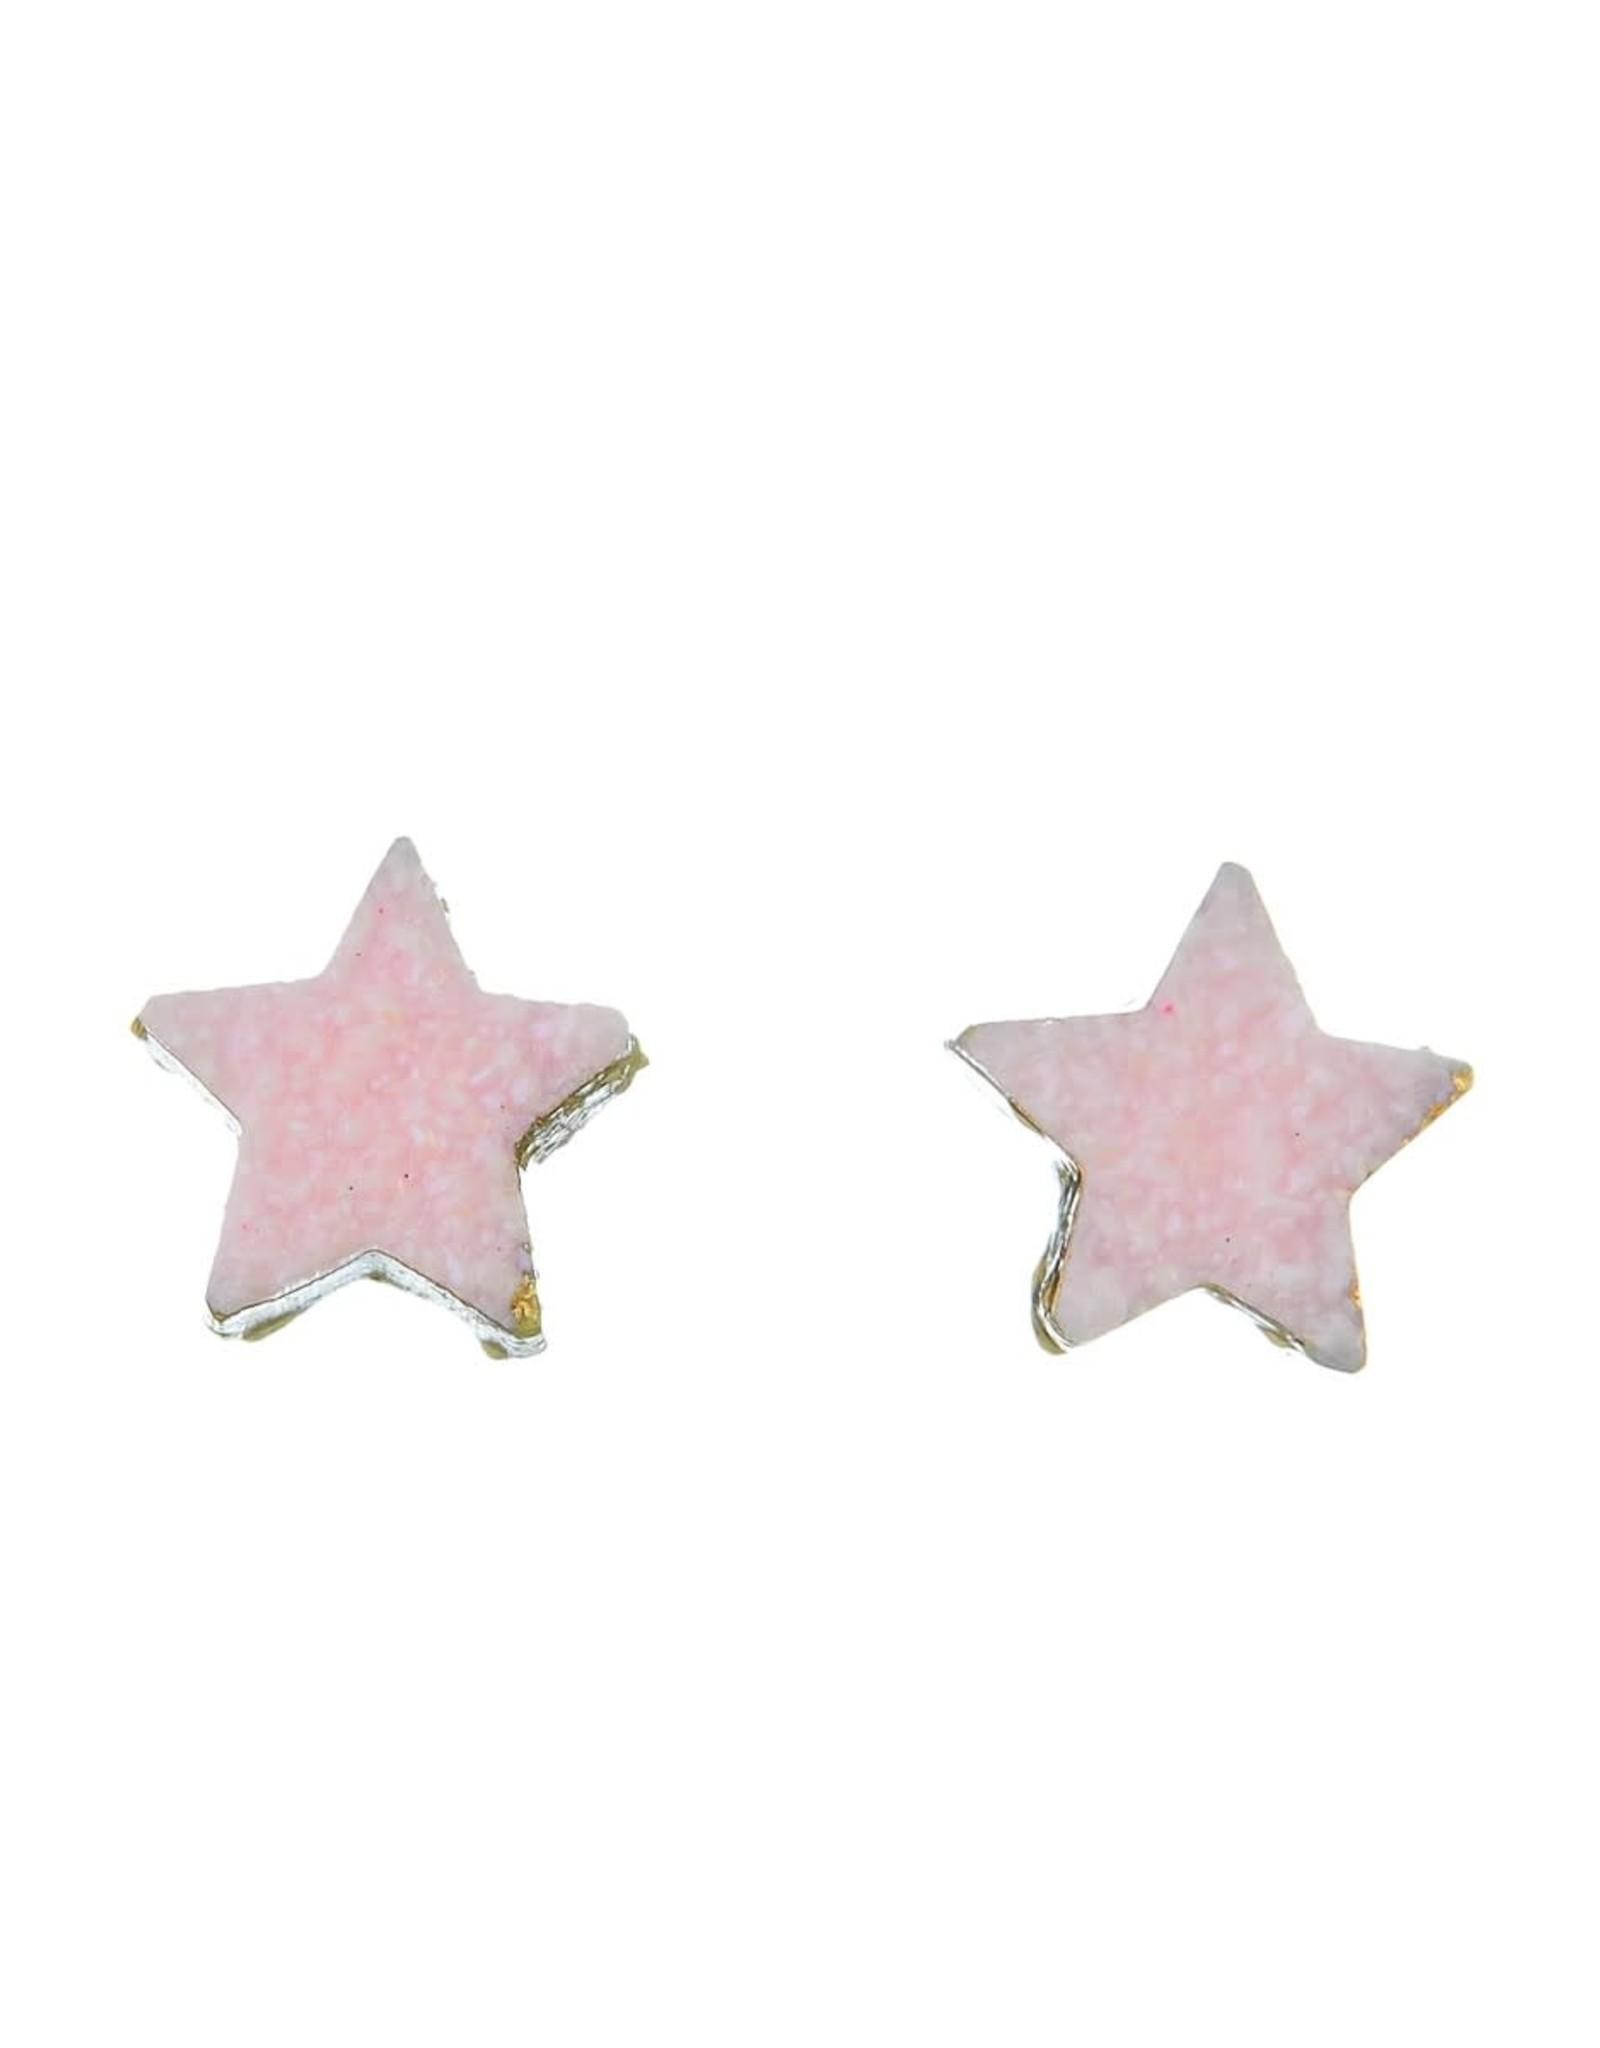 PINK DAINTY STAR POST EARRING